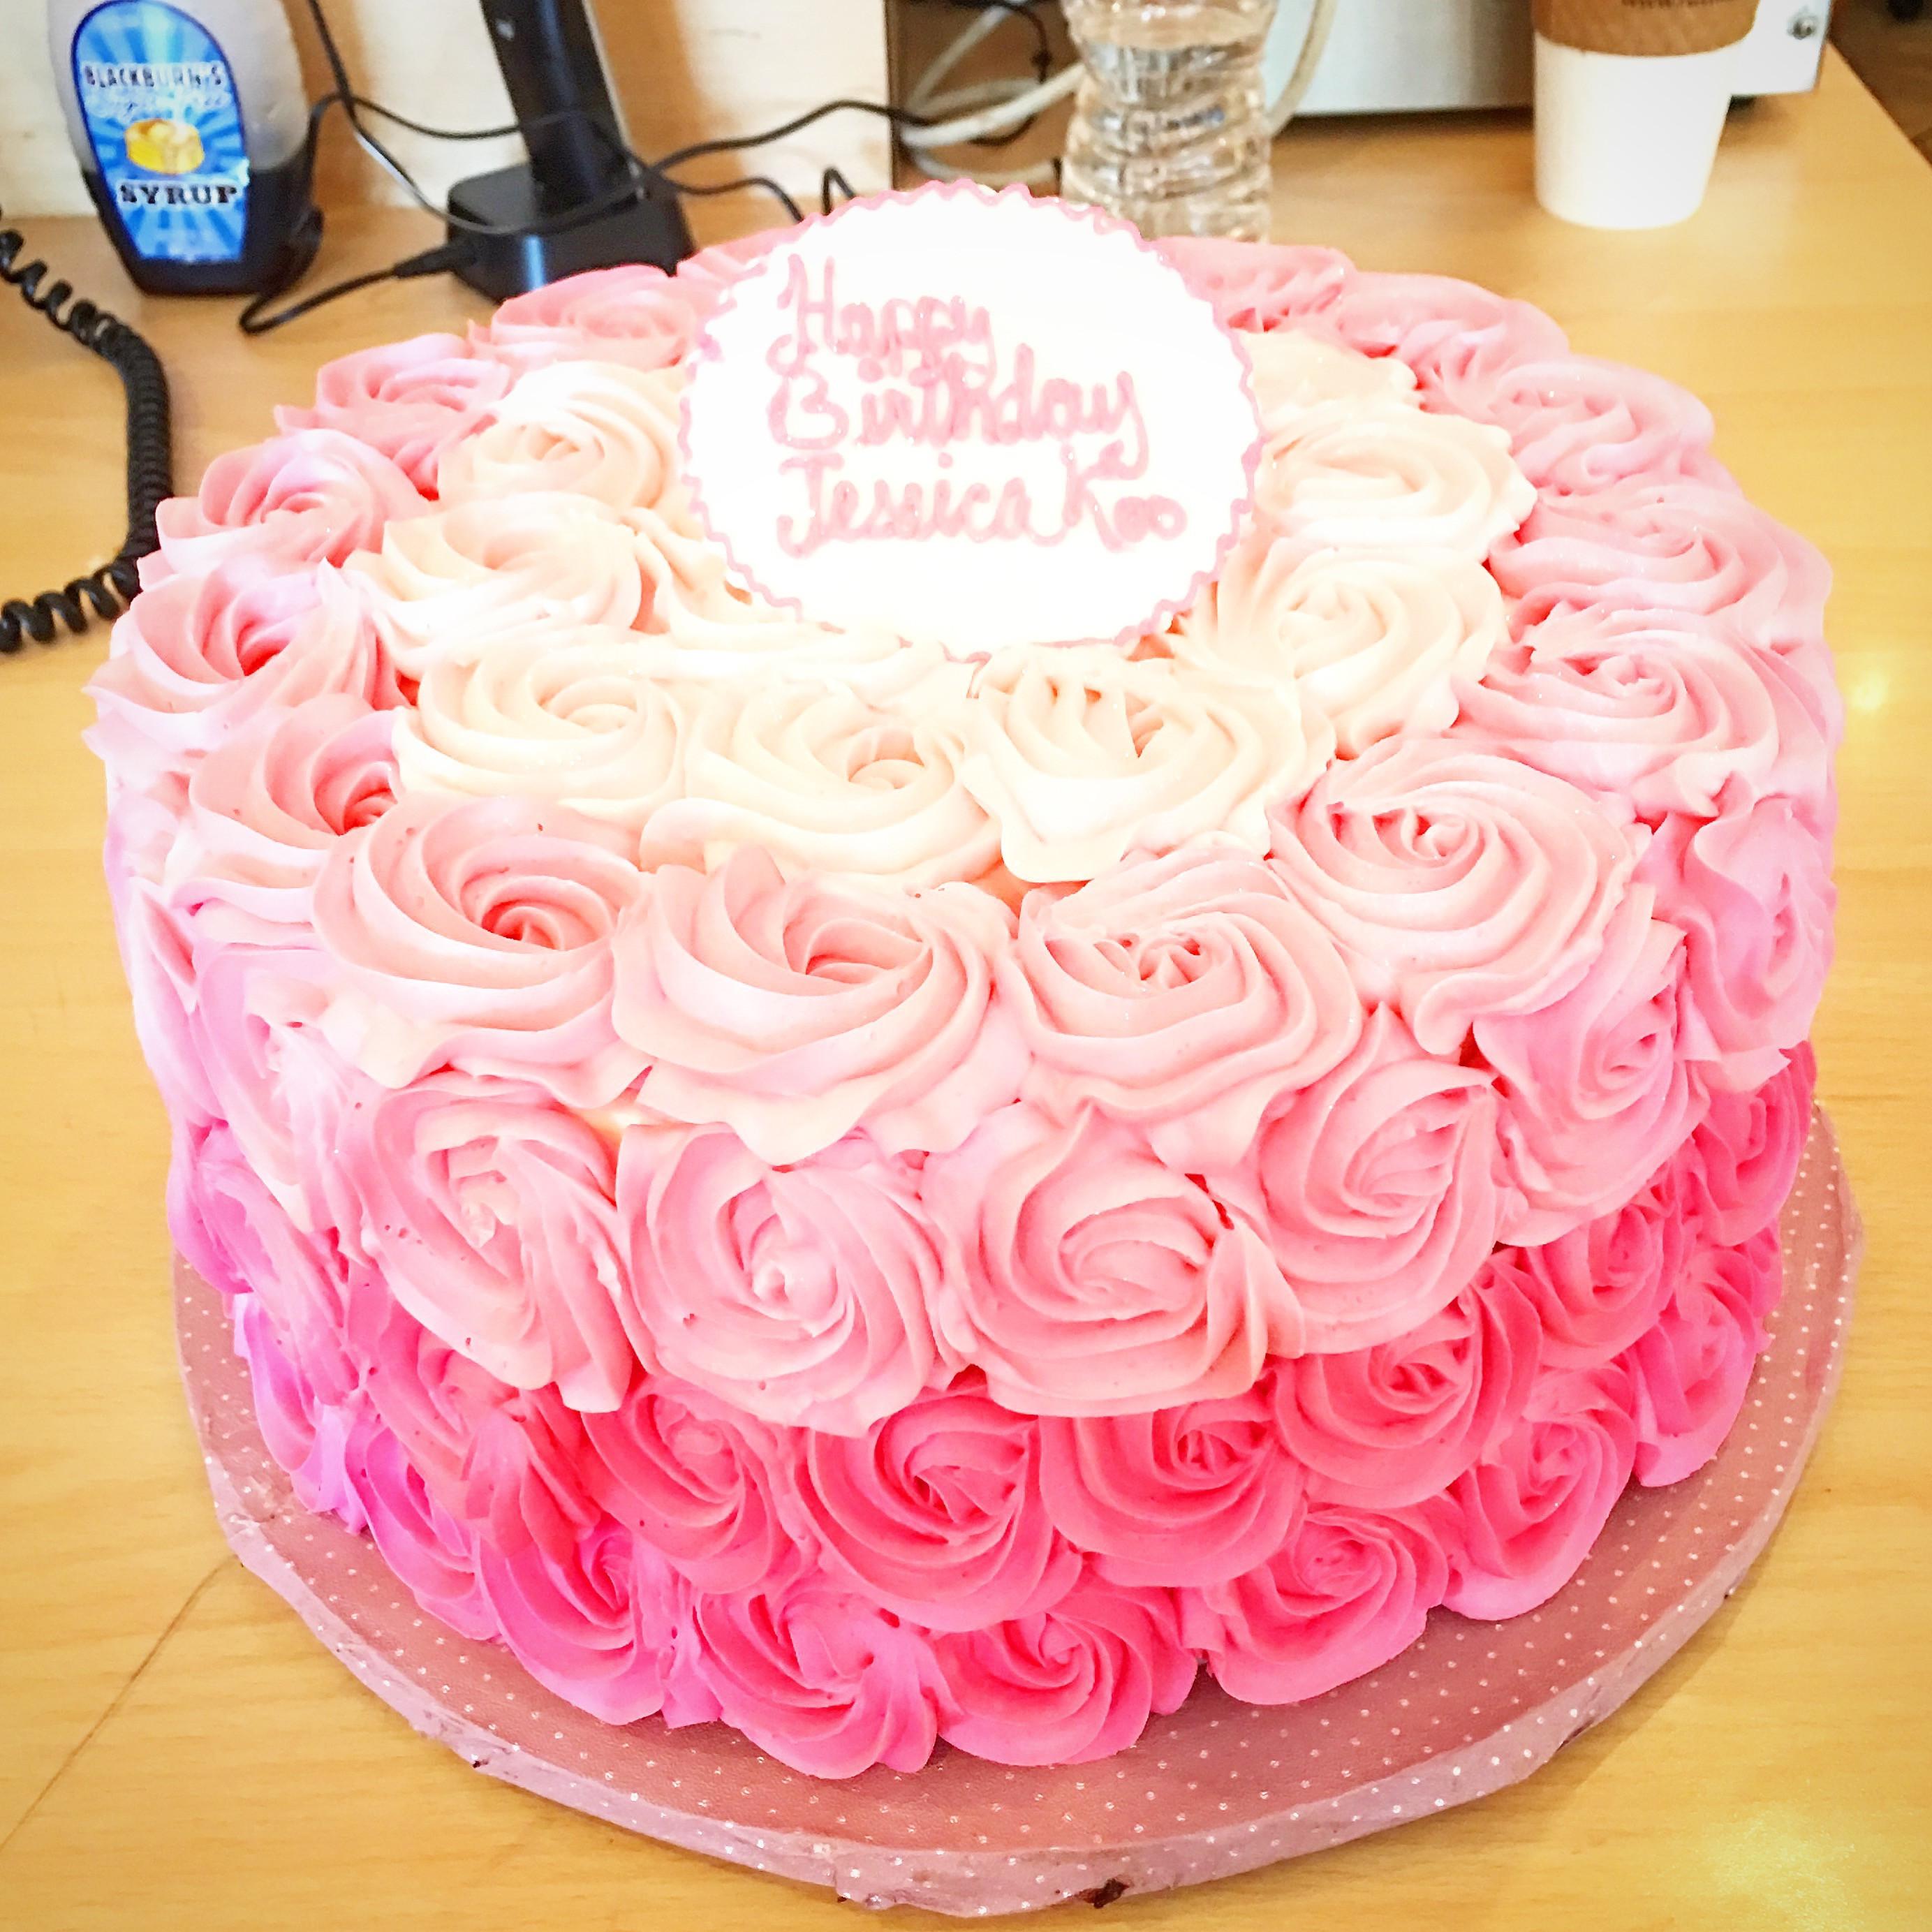 Birthday cakes by rustika cafe and bakery more izmirmasajfo